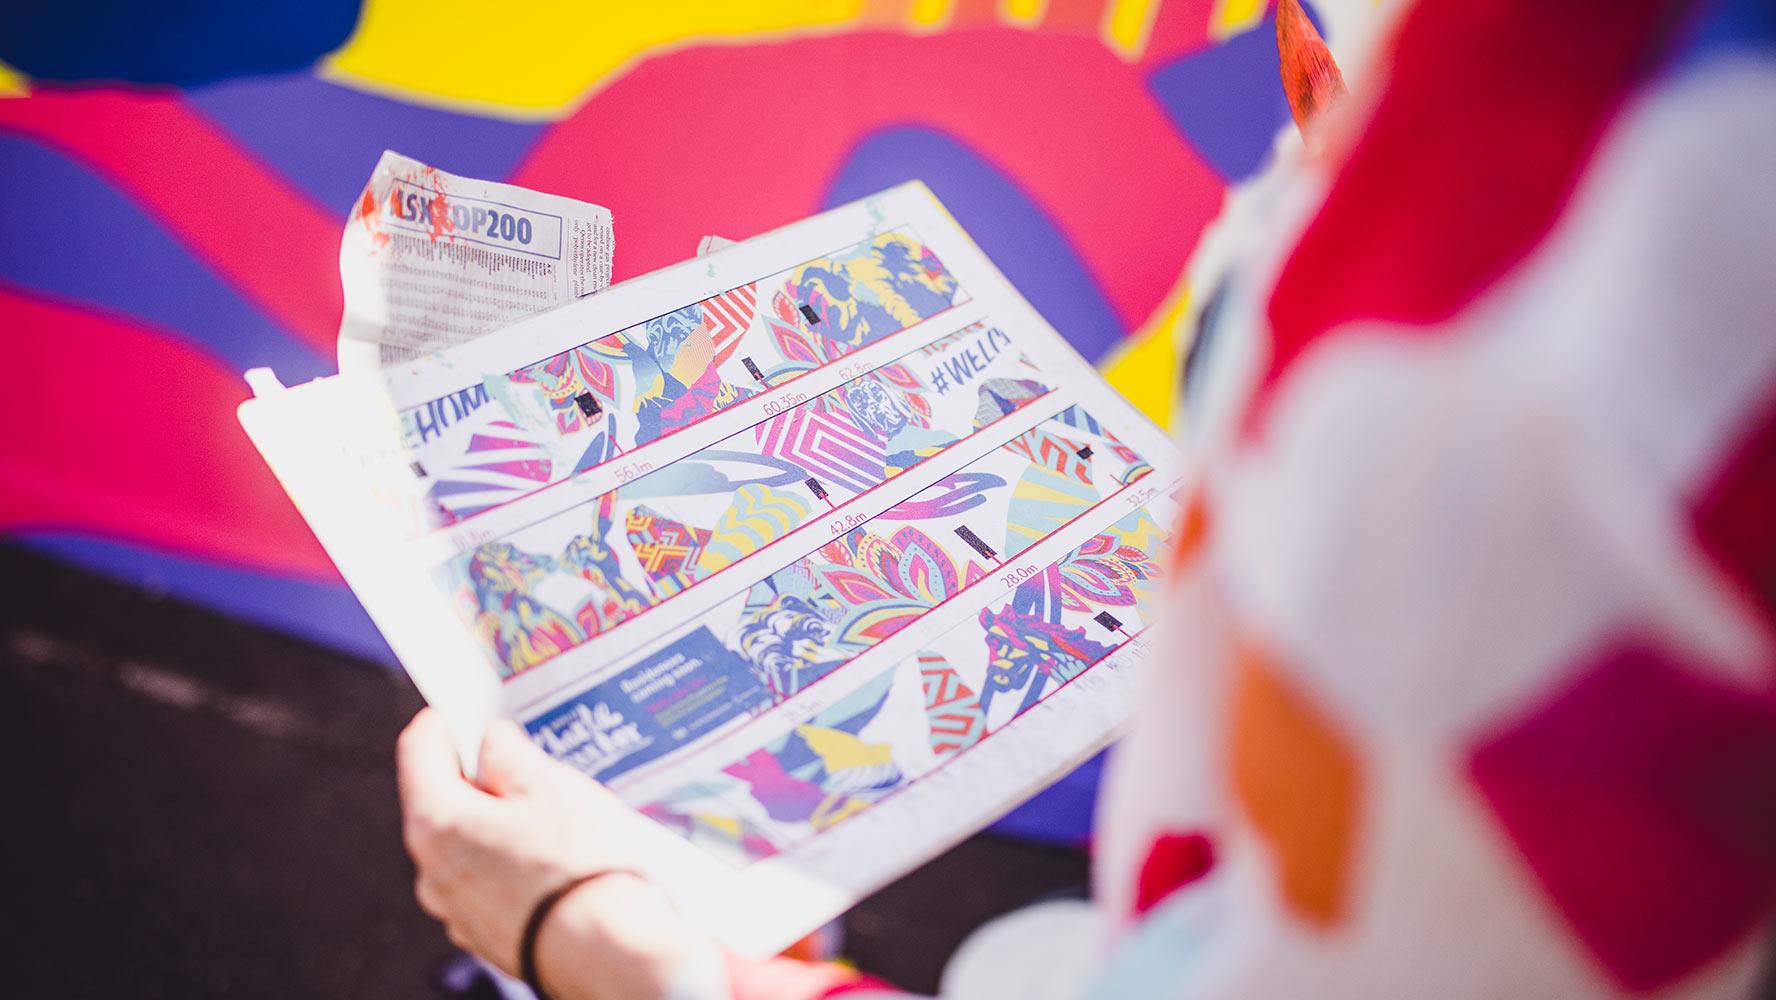 coronation_property_charlie_parker_sydney_property_campaign_mural_layout2.jpg